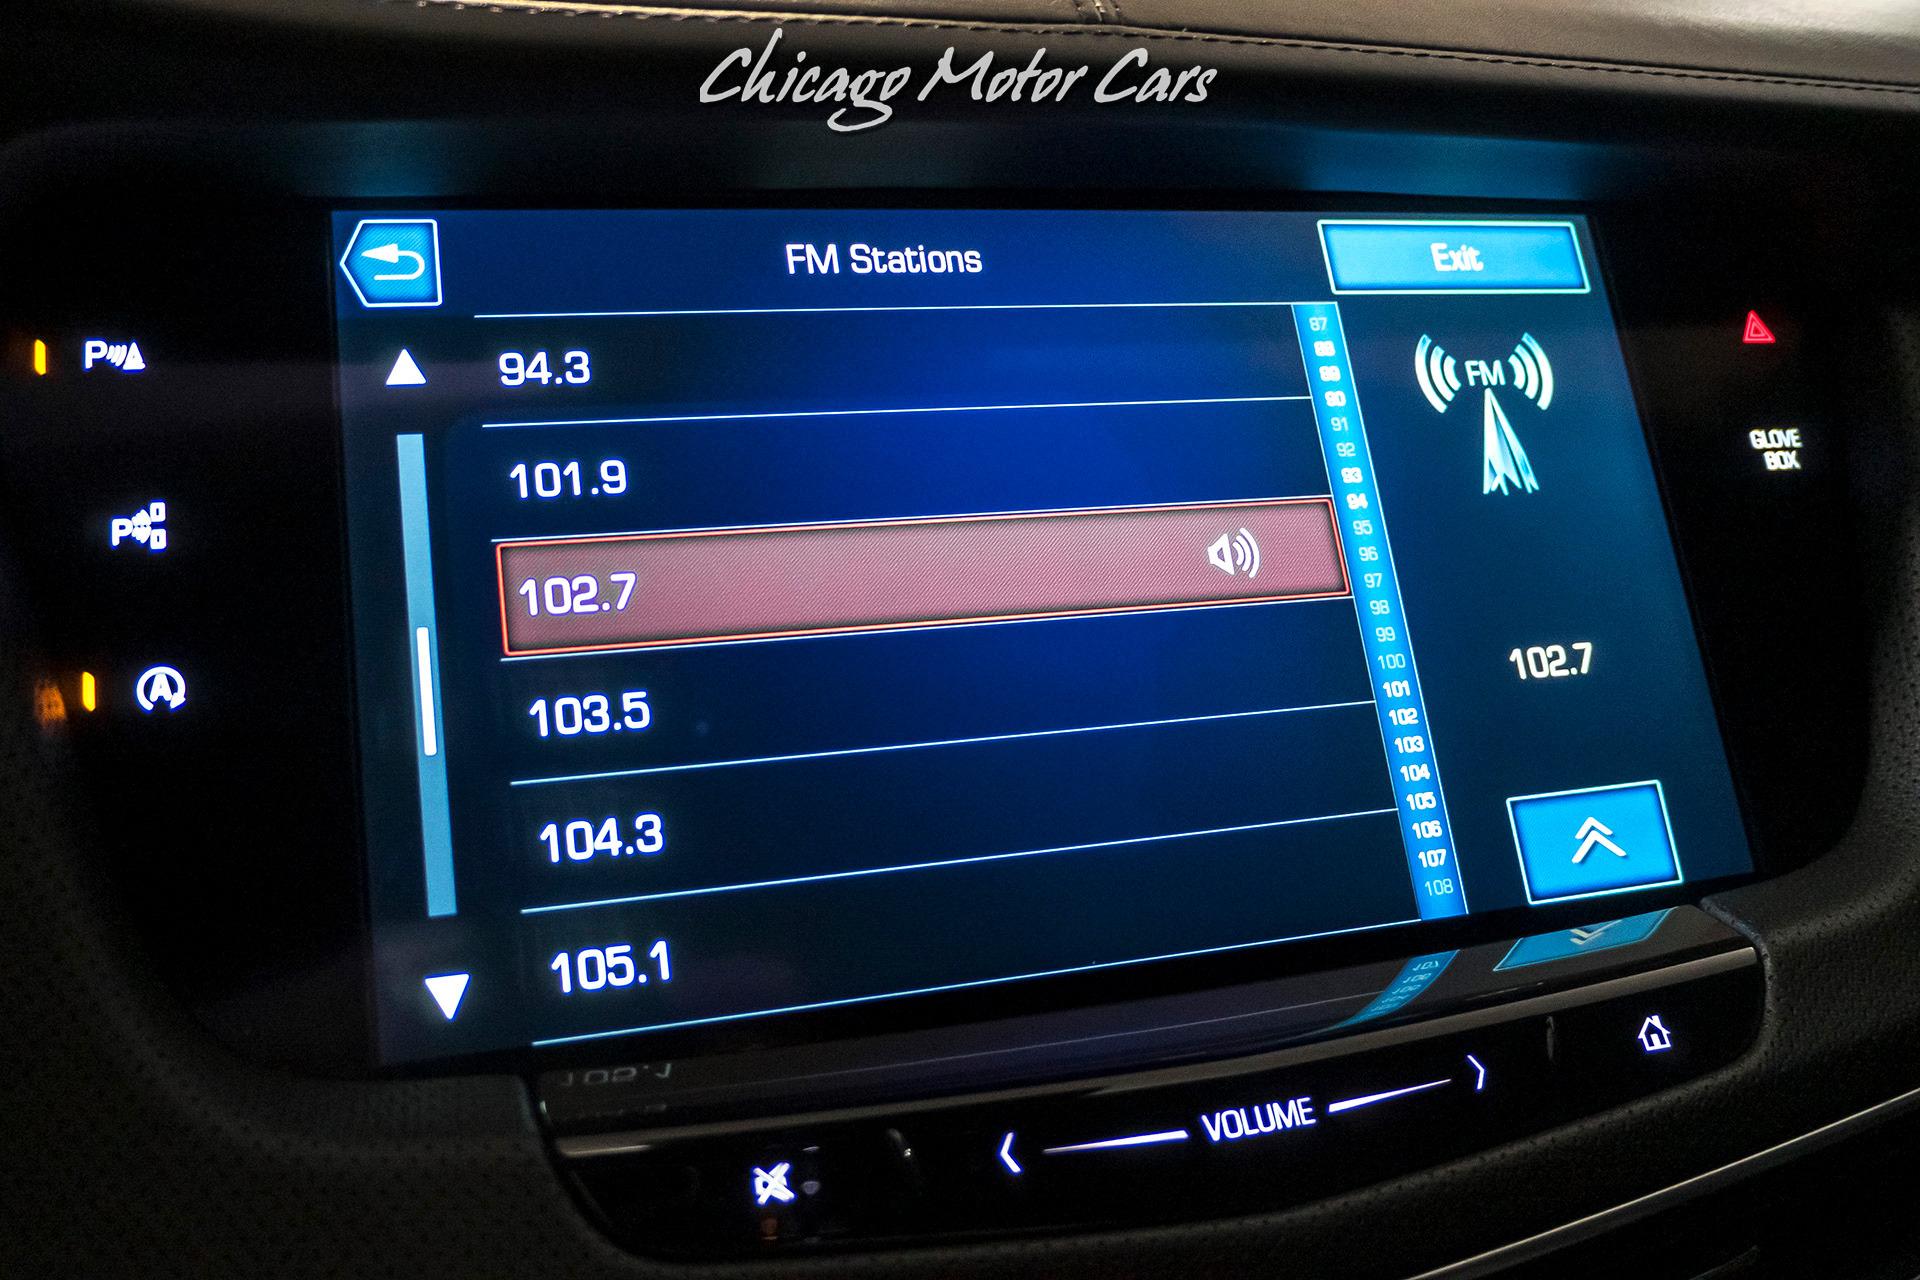 Used-2016-Cadillac-CT6-30TT-Platinum-AWD-Sedan-LOADED-REAR-SEAT-ENTERTAINMENT